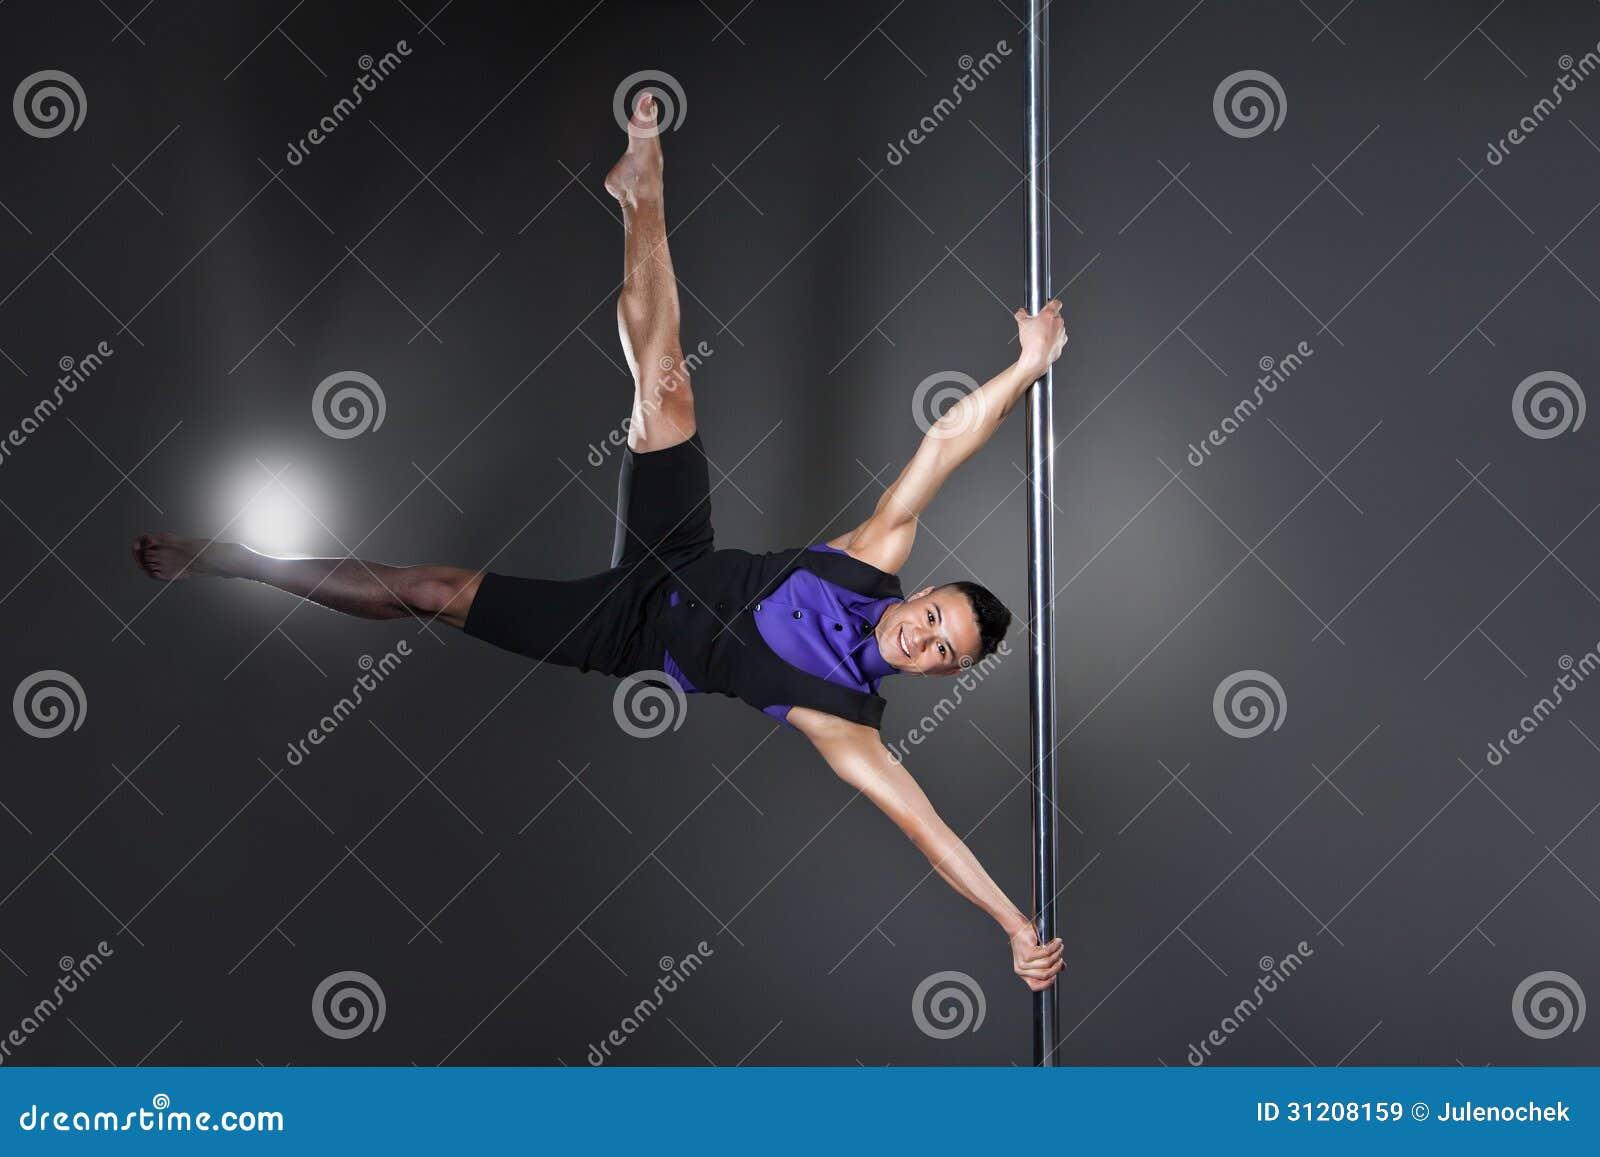 Pole dansman över svart bakgrund med exponeringar